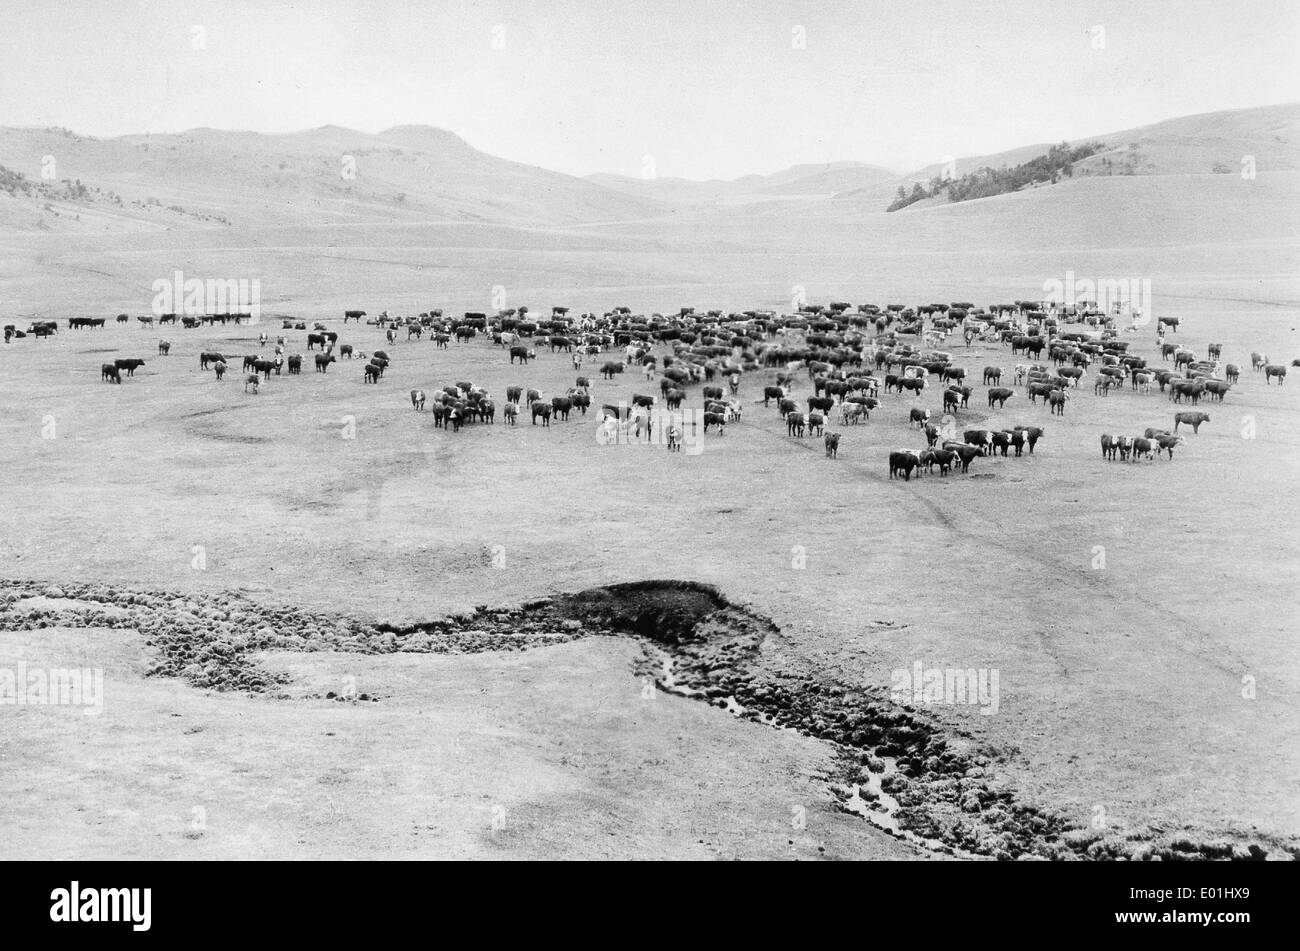 Livestock breeding in Argentina, around 1930 - Stock Image